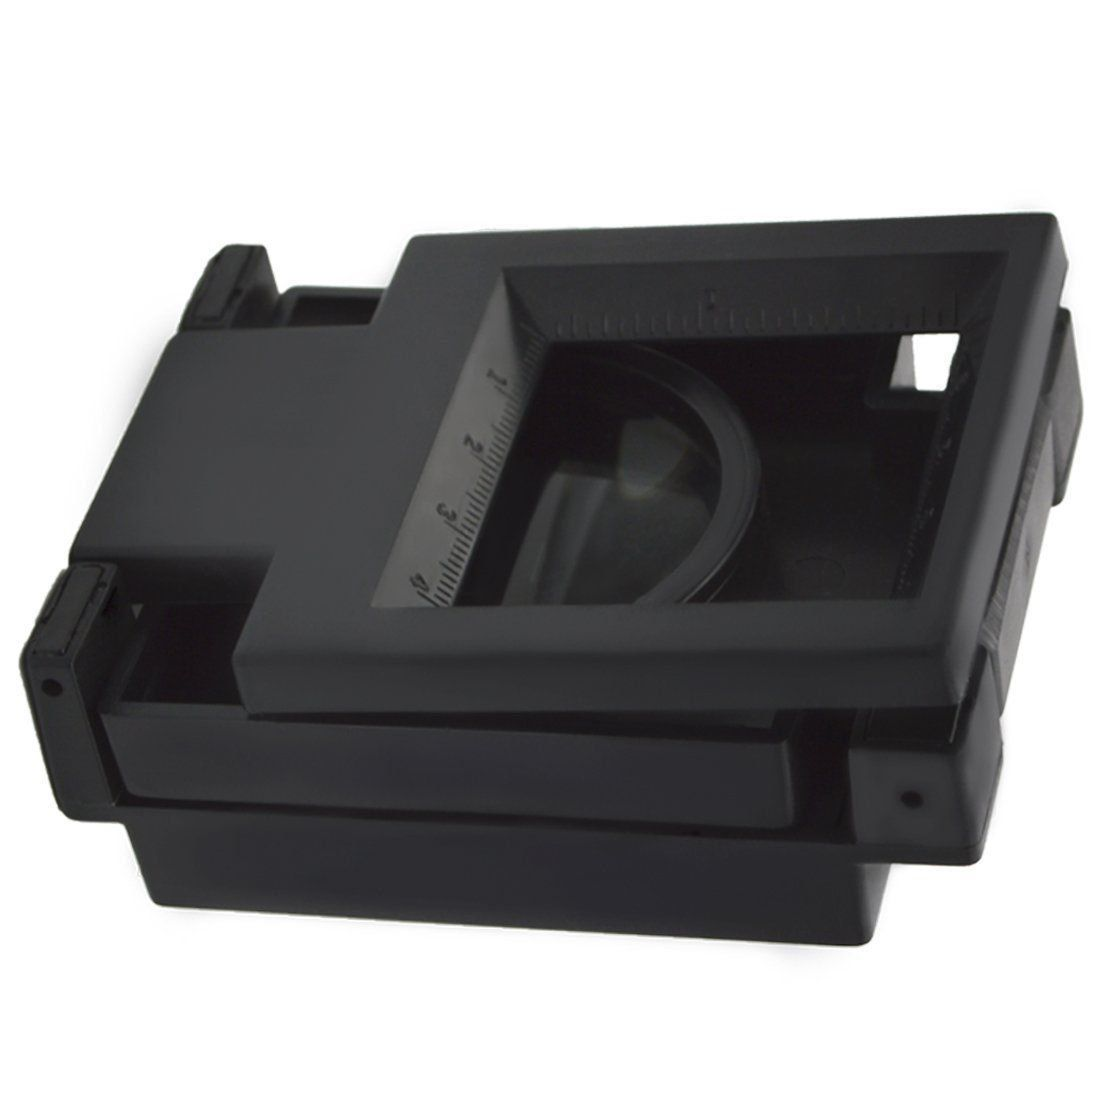 Lupa Conta Fios Aumento 5D Portátil e Dobrável Solver SLF-150 LED  - EMPORIO K